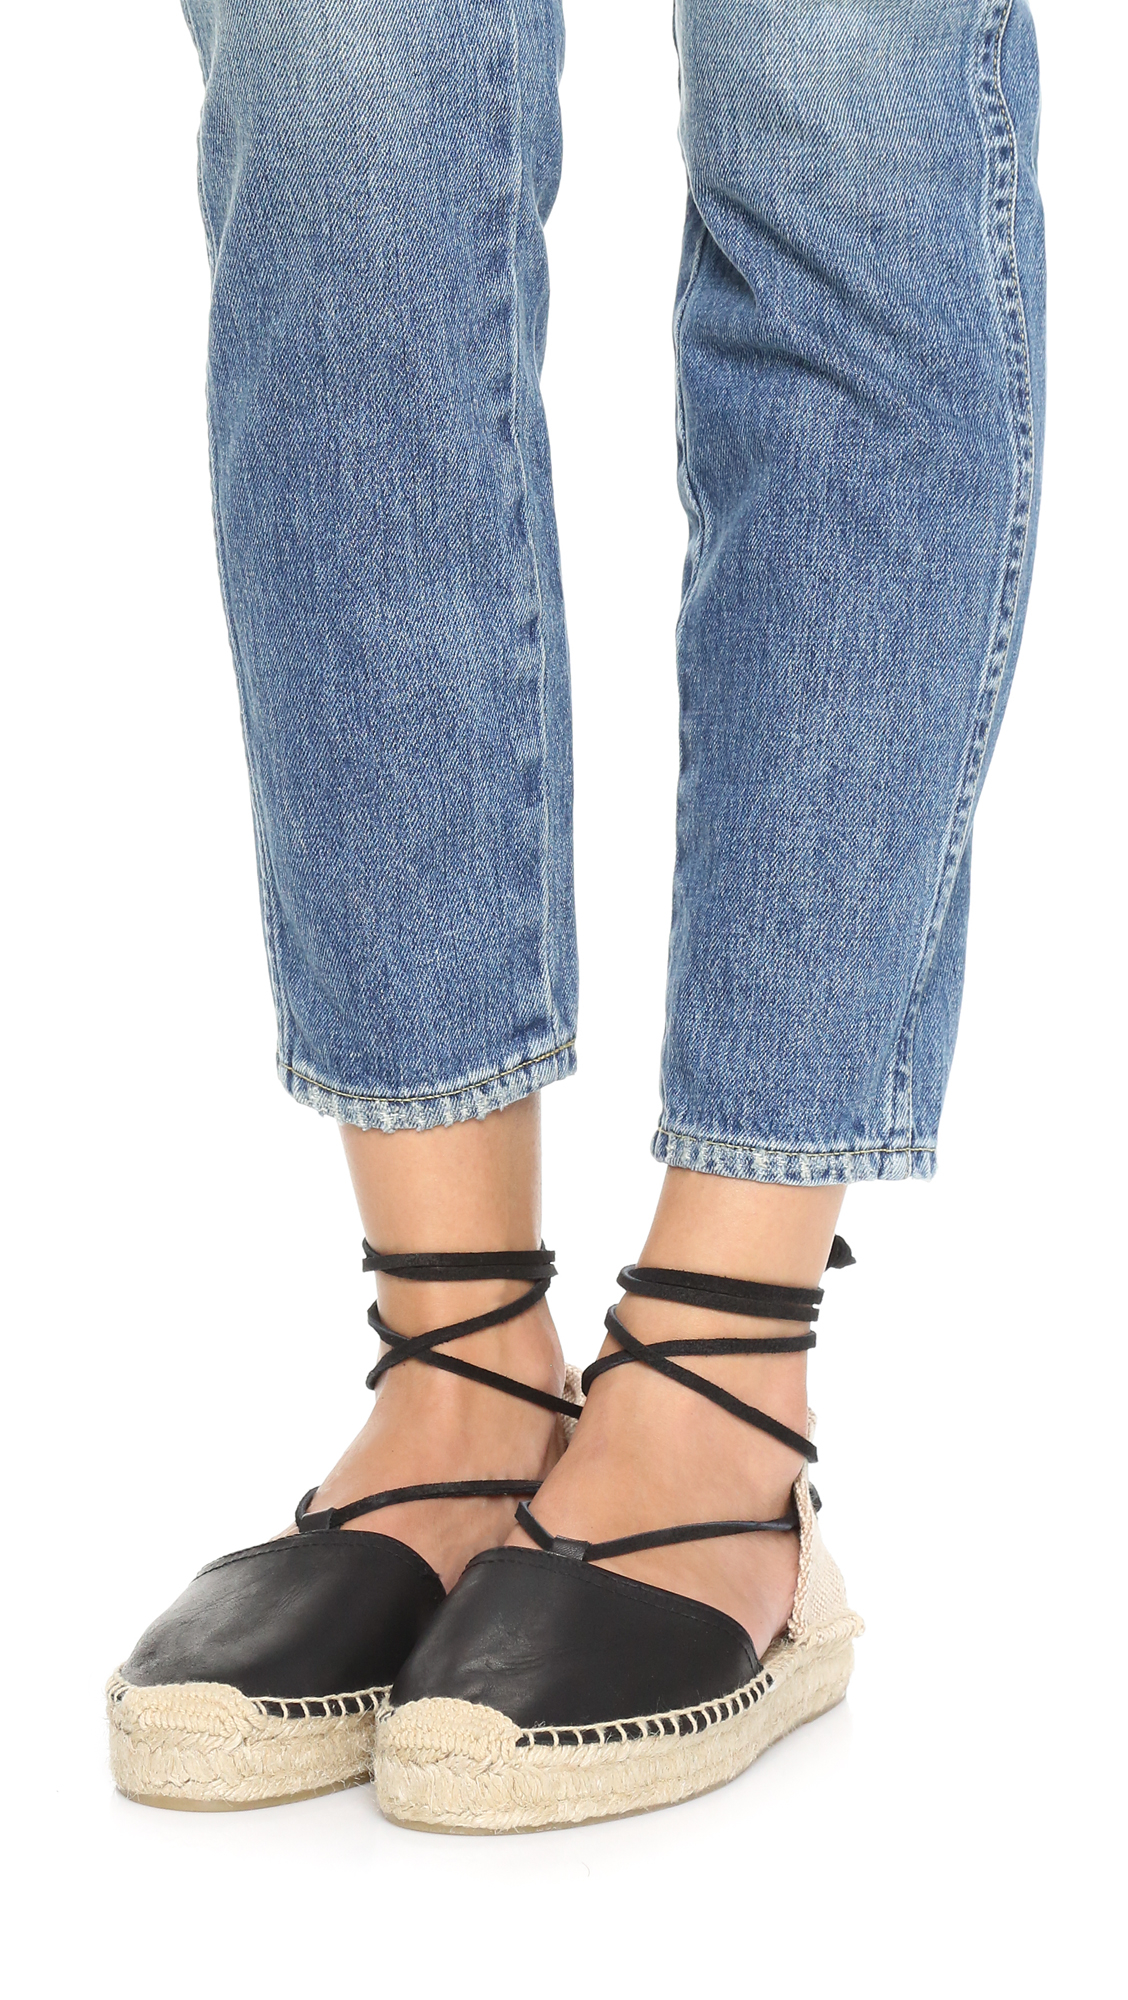 f4f072382a1 Lyst - Soludos Platform Gladiator Sandals in Black